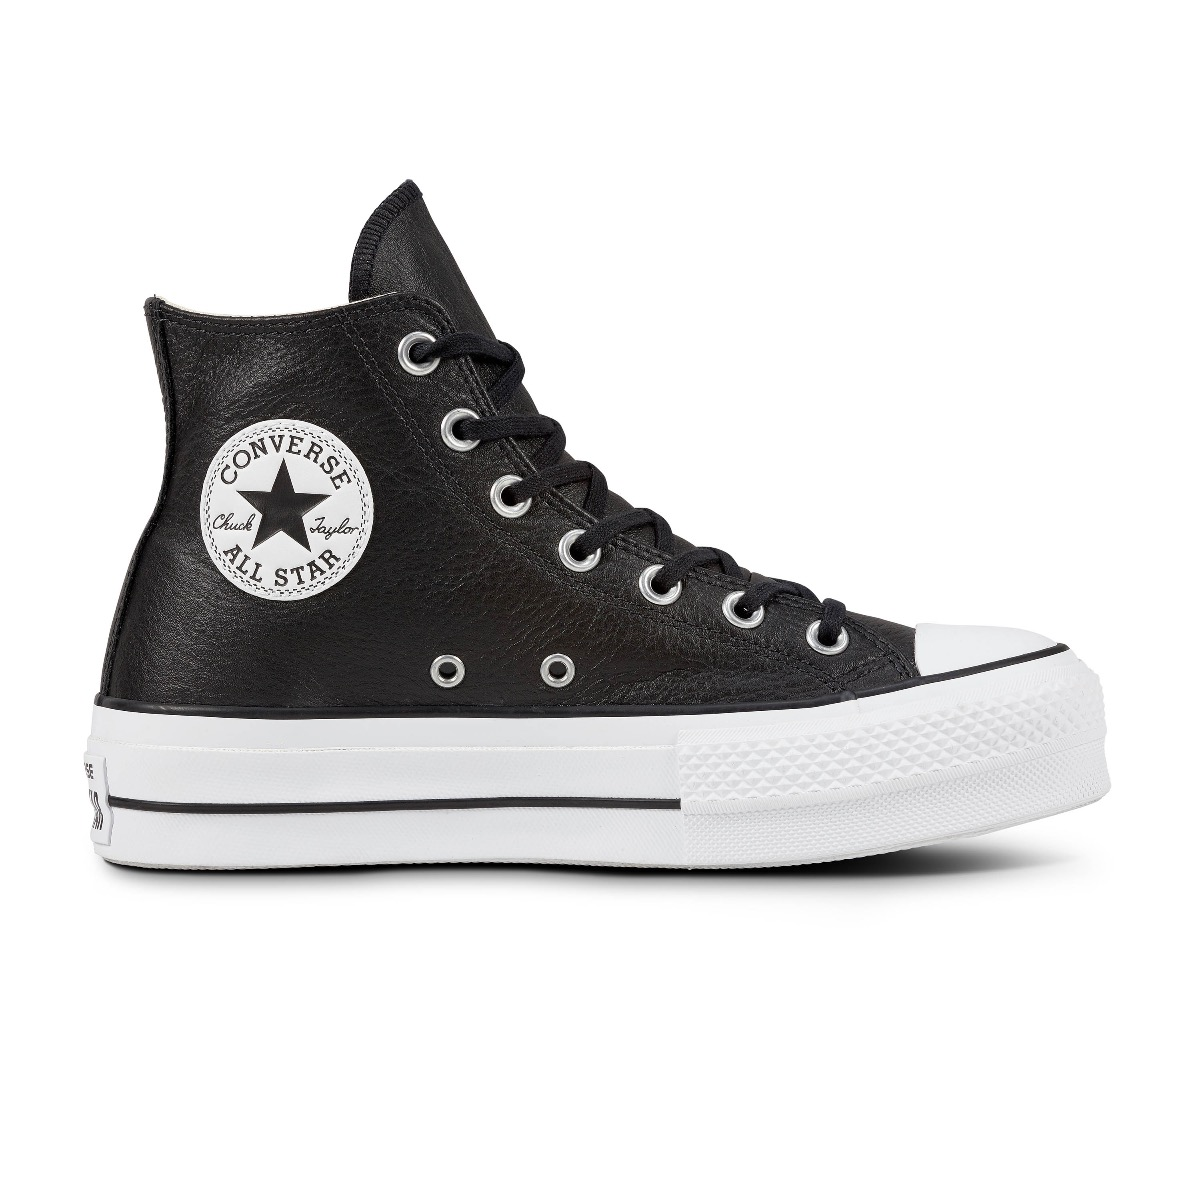 Converse All Stars Lift Clean 561675C Zwart - Wit-35 maat 35